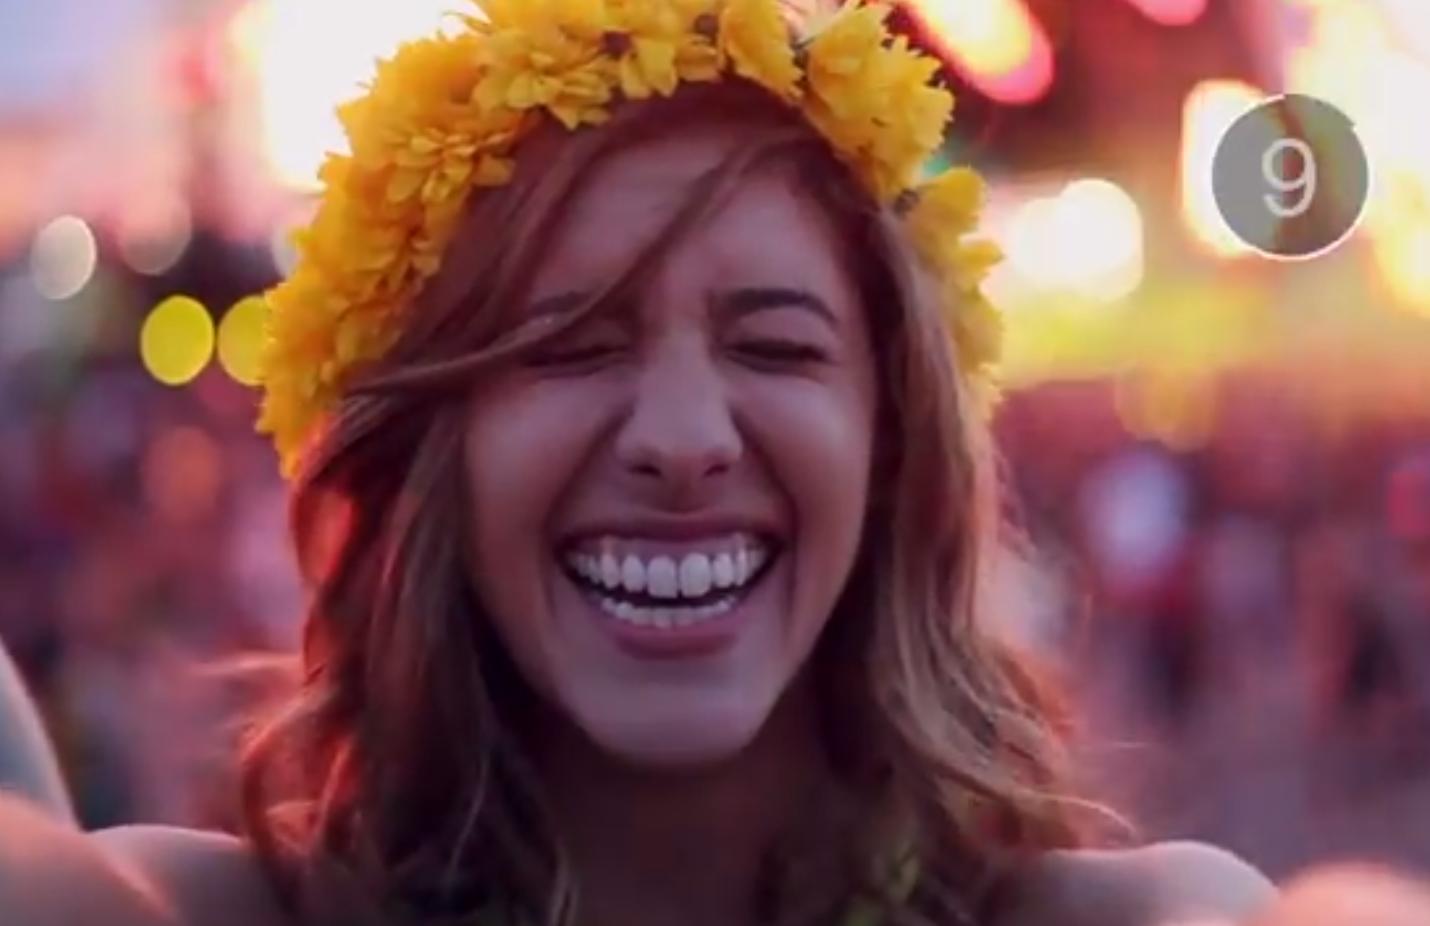 Obligatory girl in flower crown at festival. (Screengrab via Snapchat)